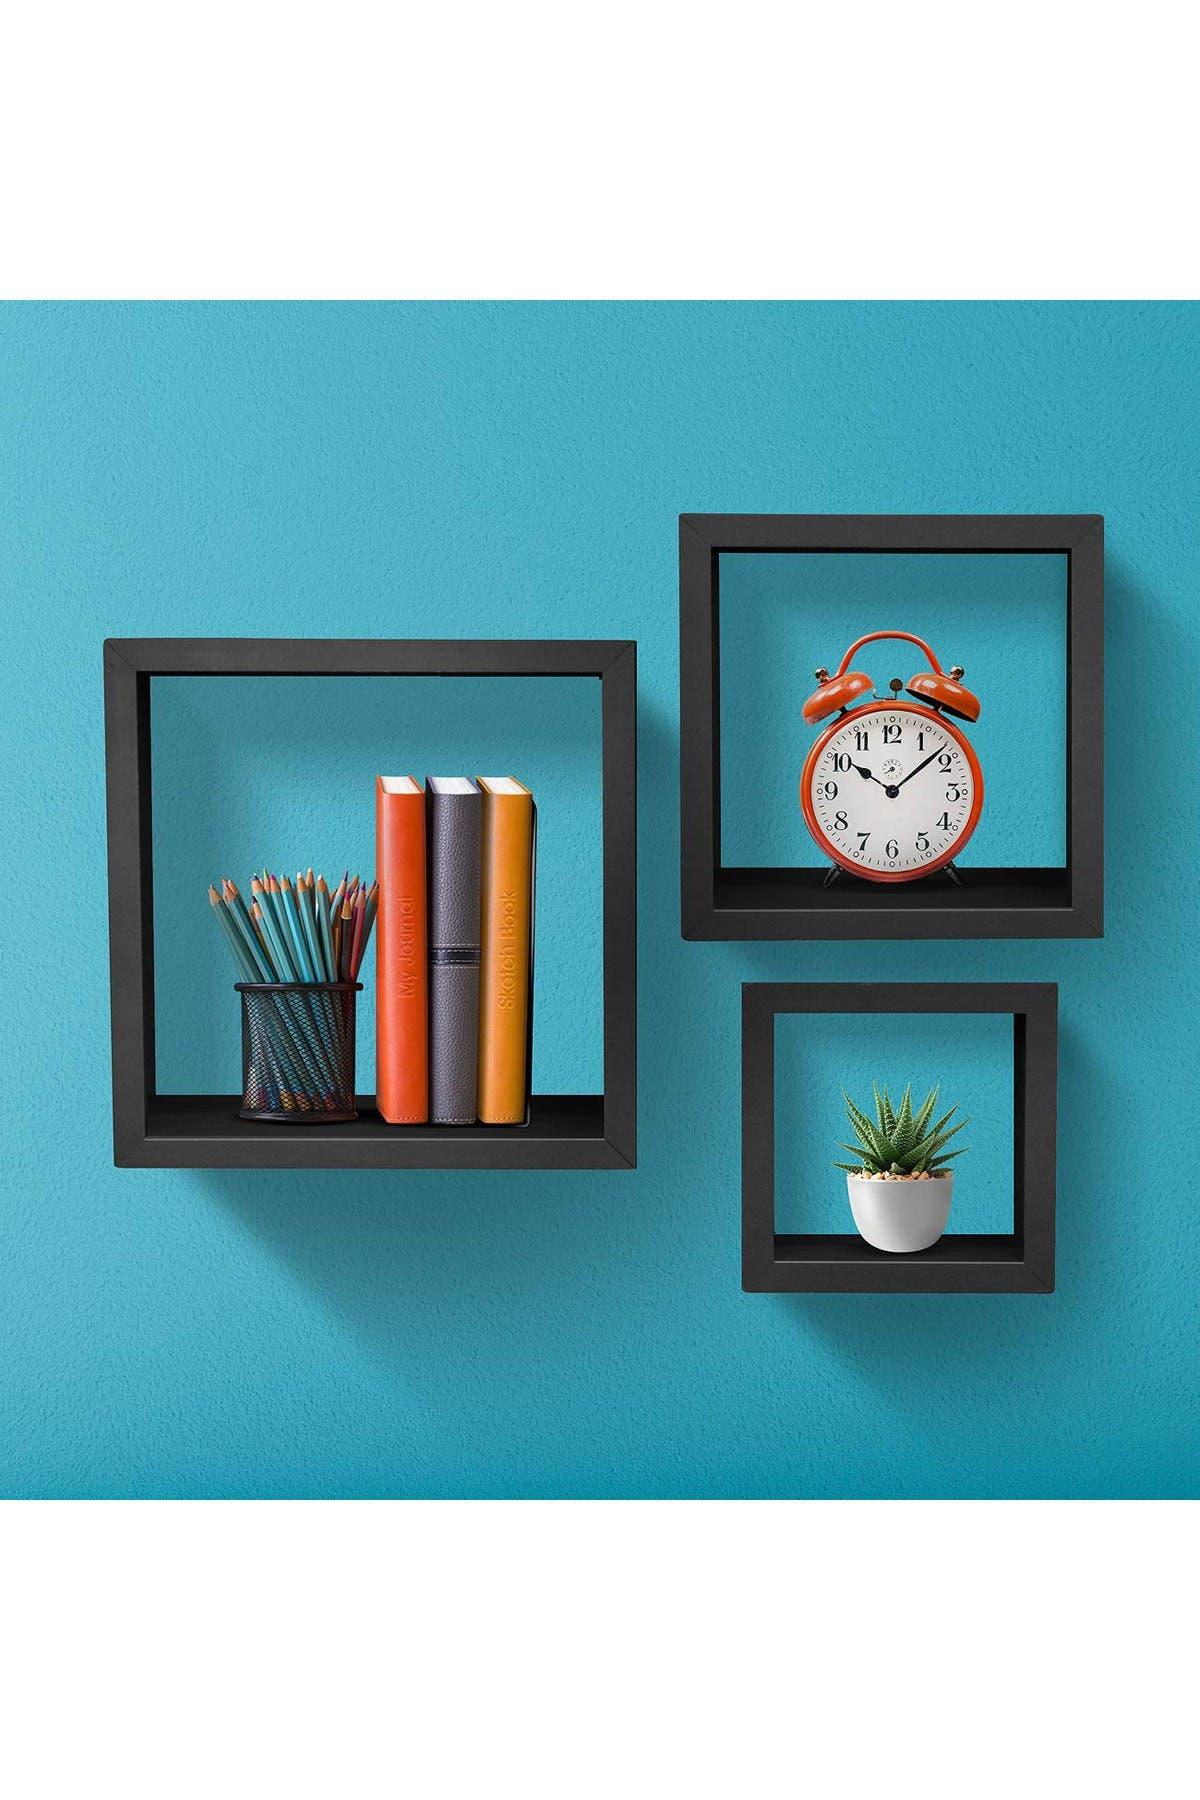 Image of Sorbus Square Decor Shelves - Set of 3 - Matte Black